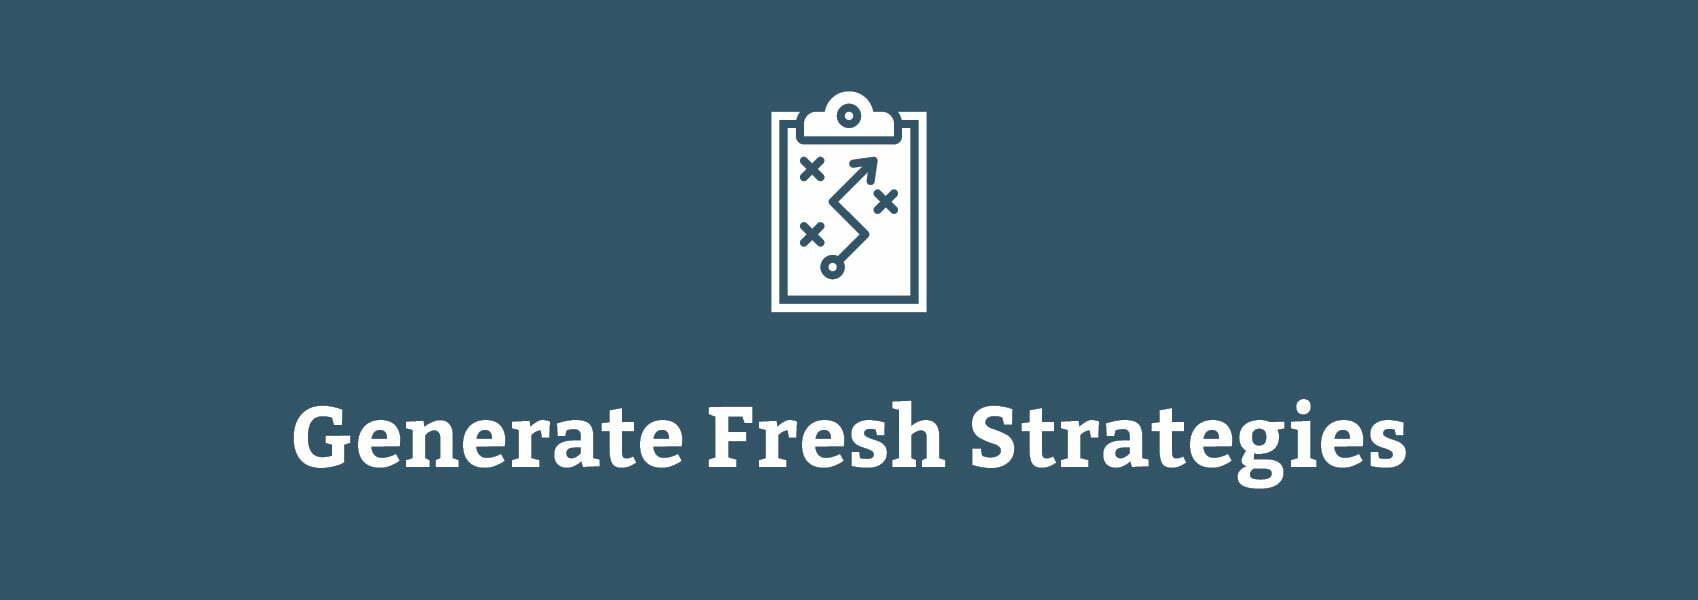 generate fresh strategies